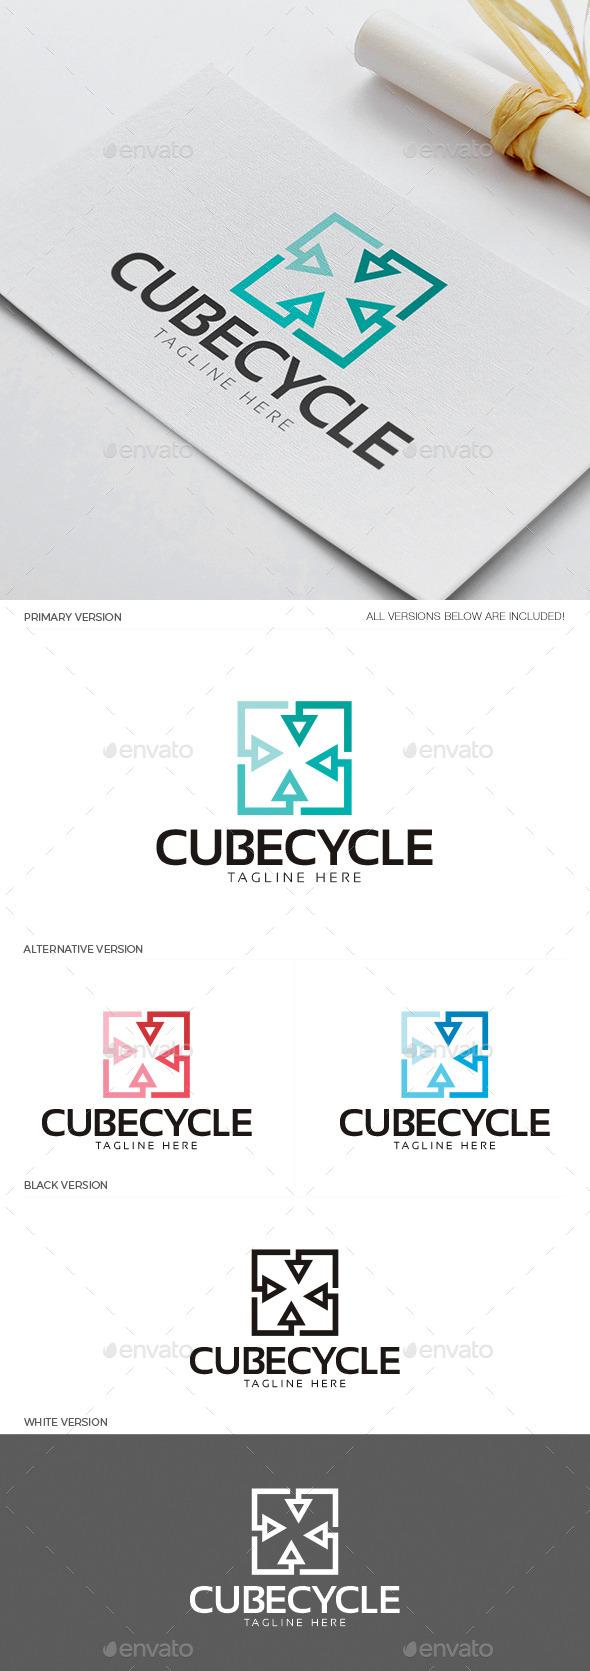 Cube Cycle Logo